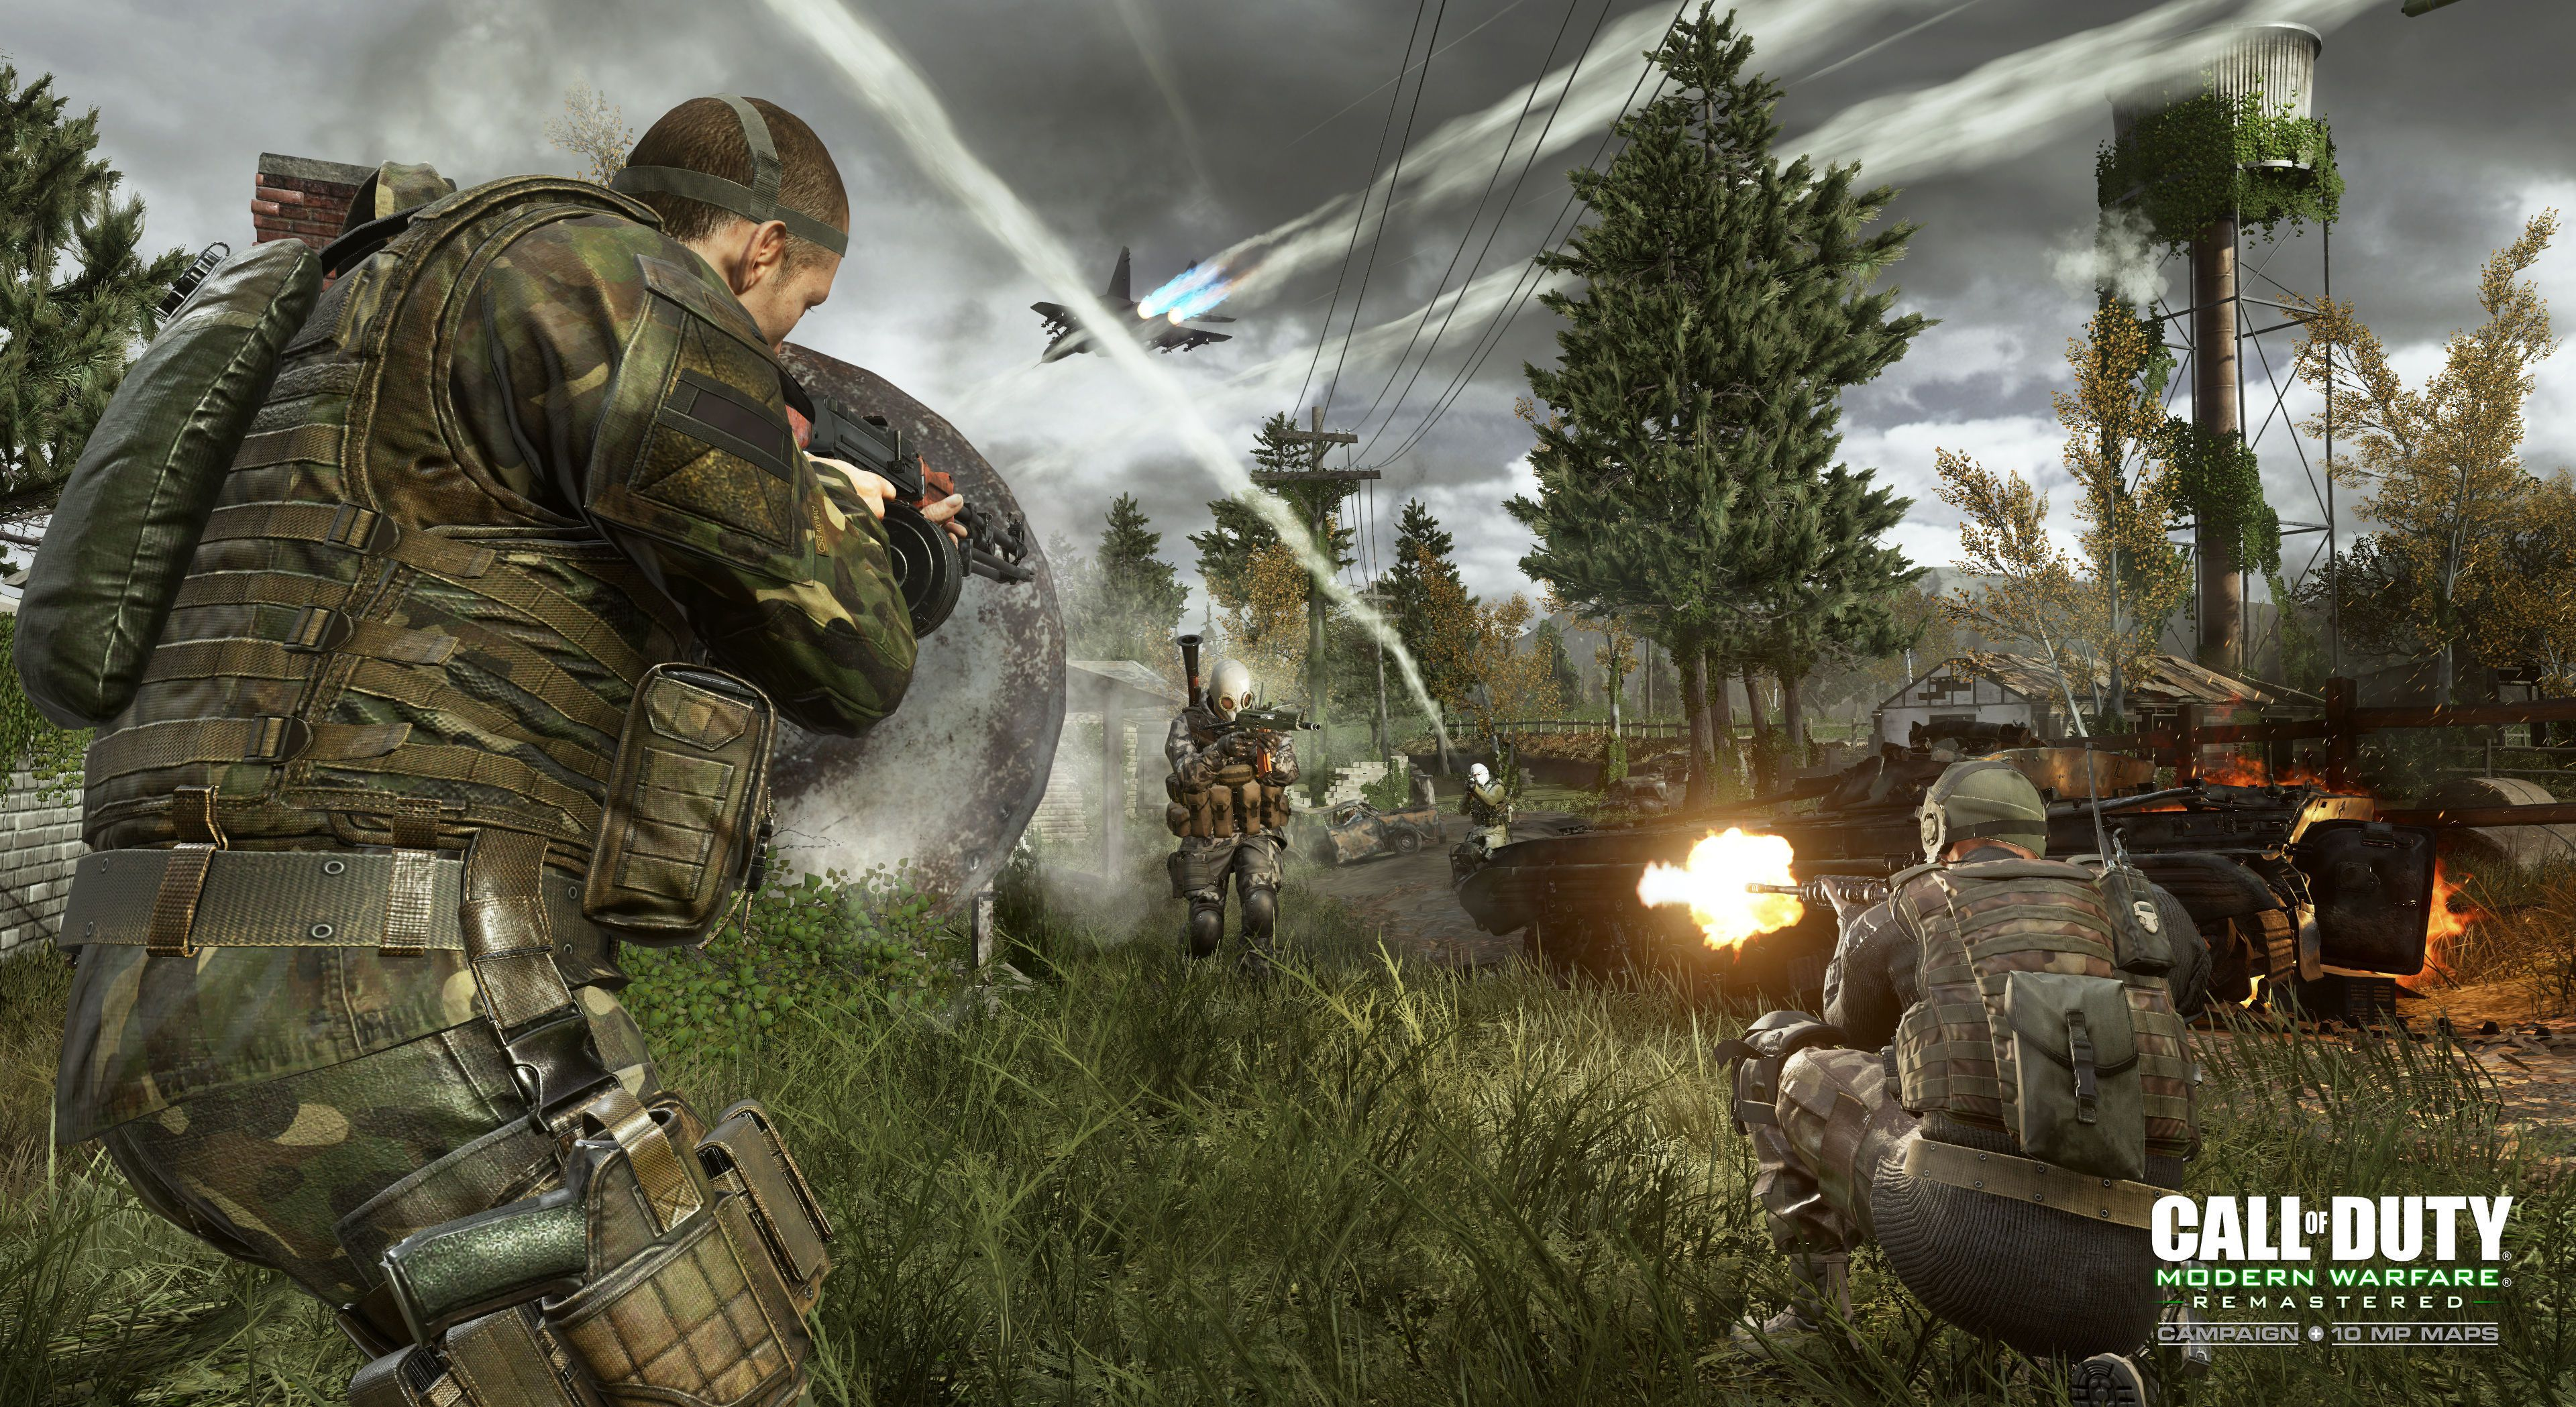 Pin On Call Of Duty Modern Warfare